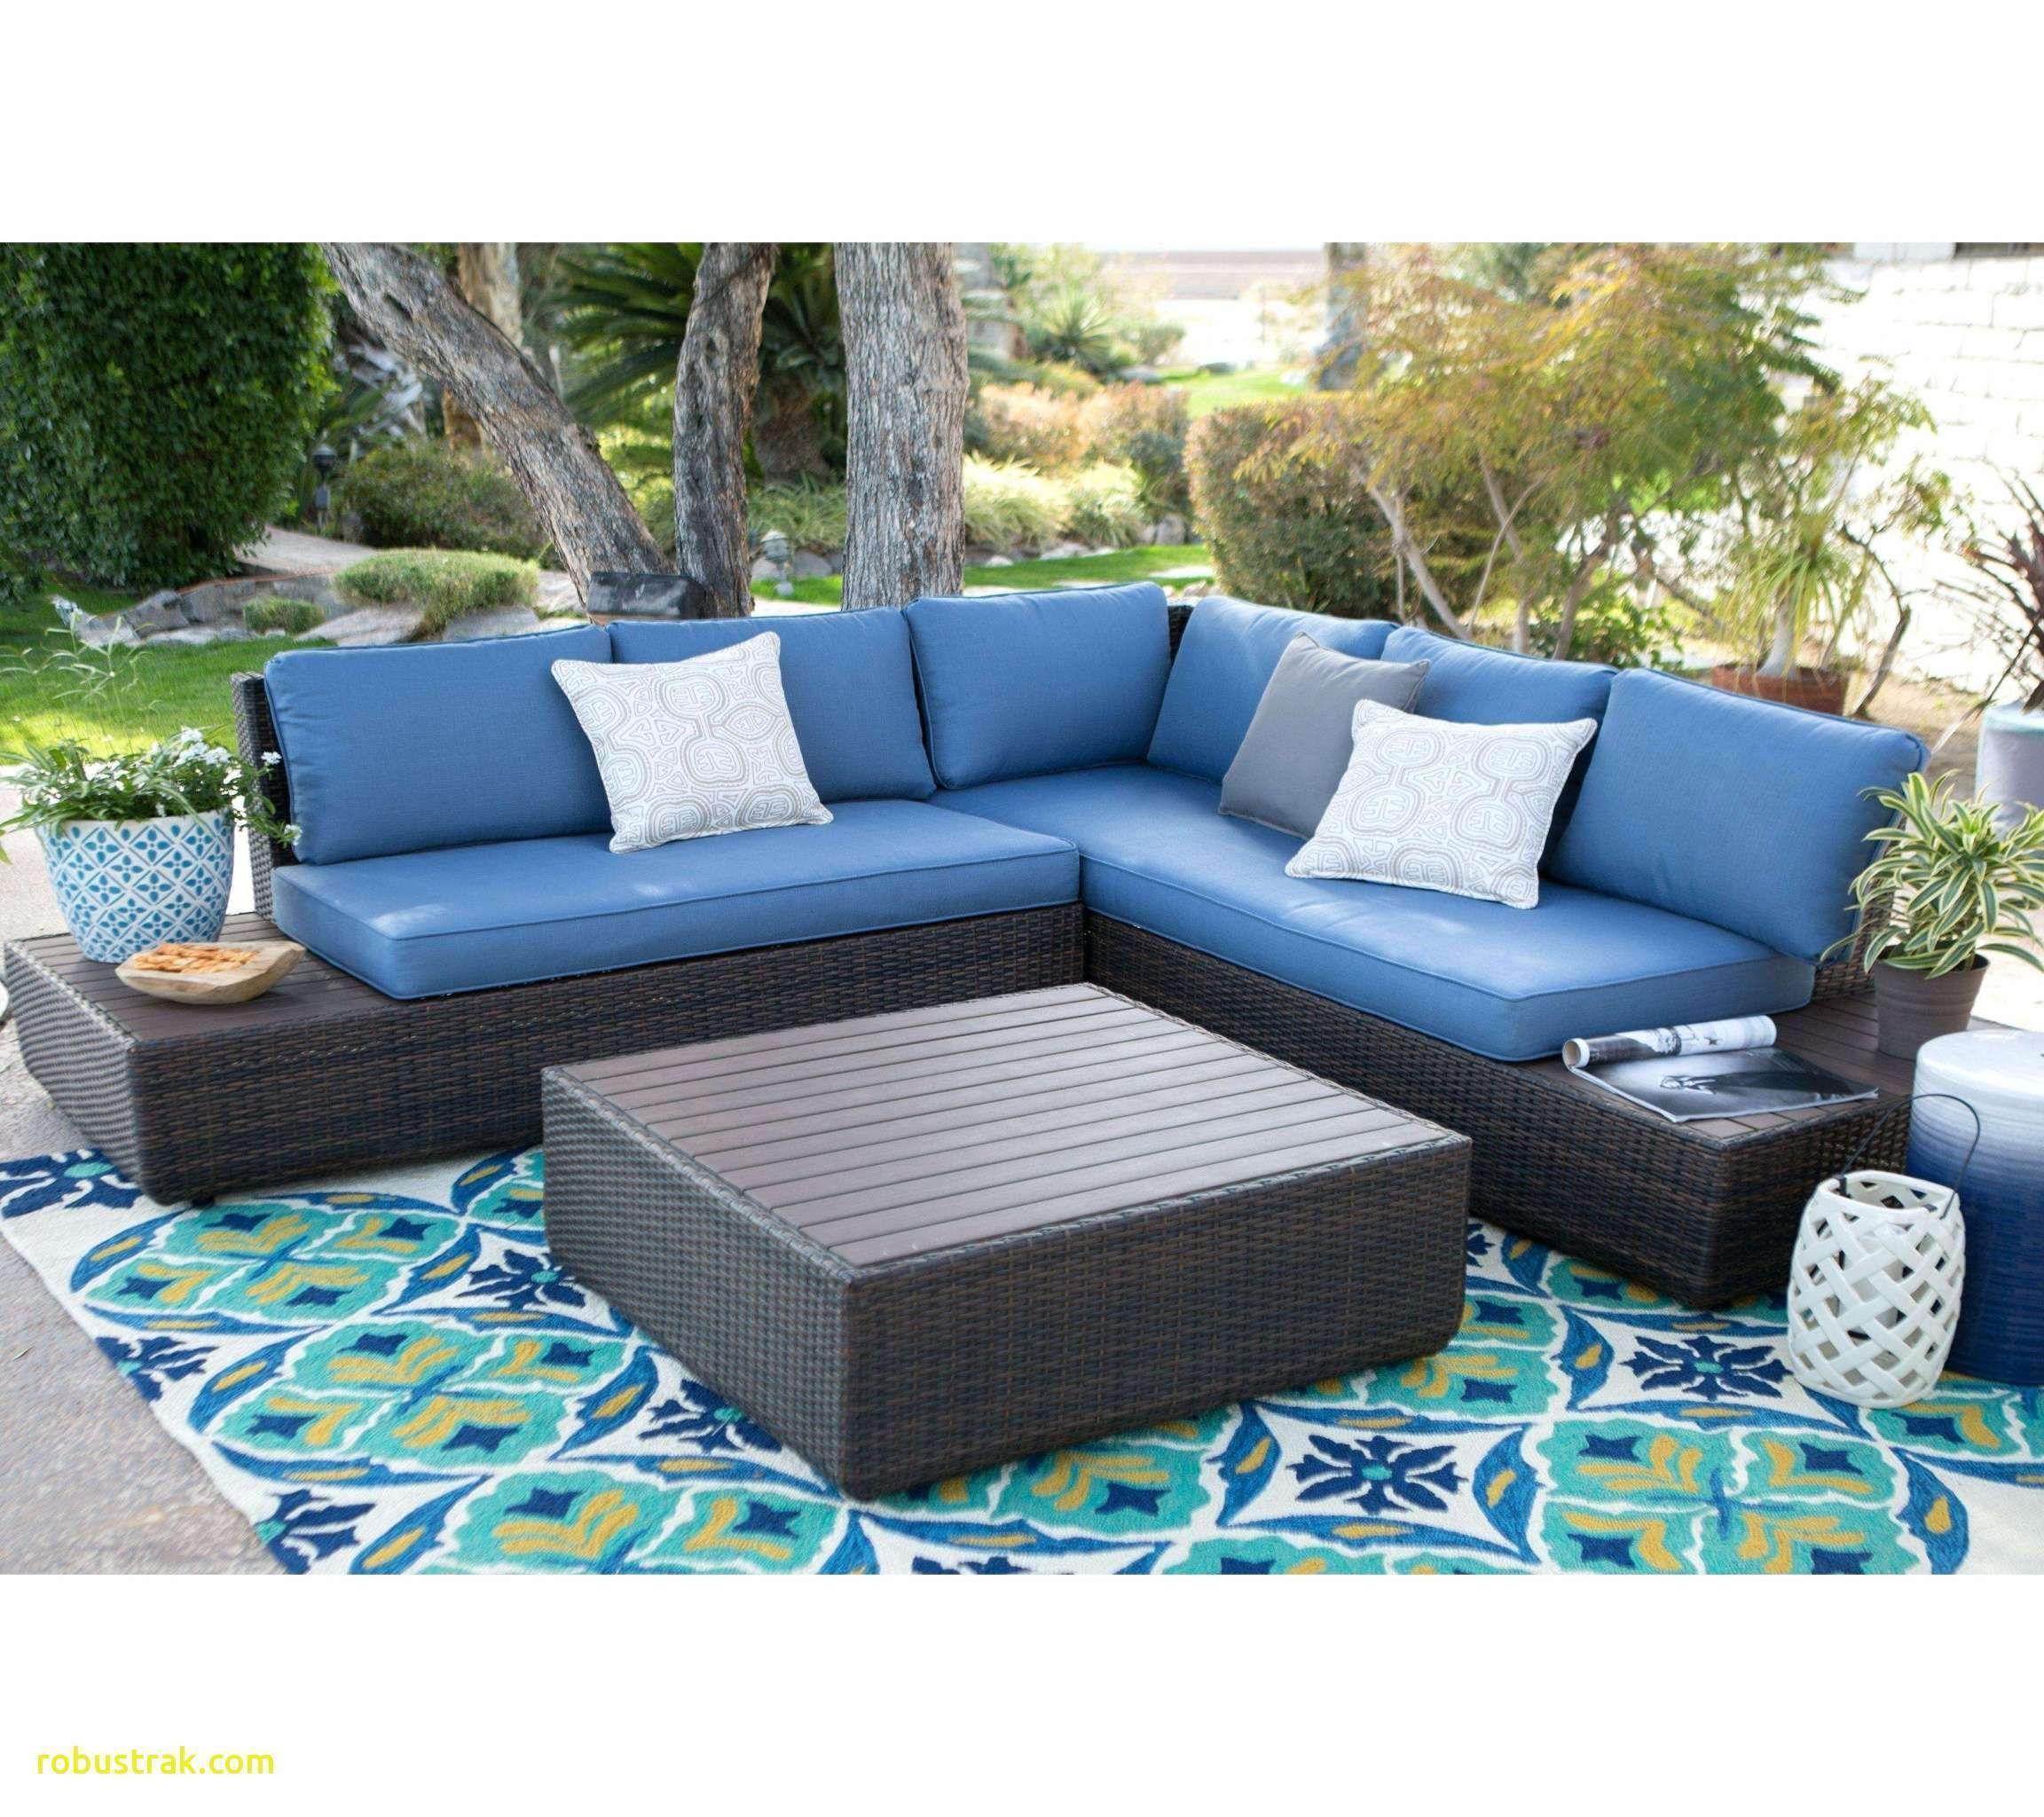 Inspirational Pallet Furniture For Sale Homedecoration Homedecorations Homedecorationid Outdoor Sectional Sofa Outdoor Furniture Cushions Wicker Loveseat